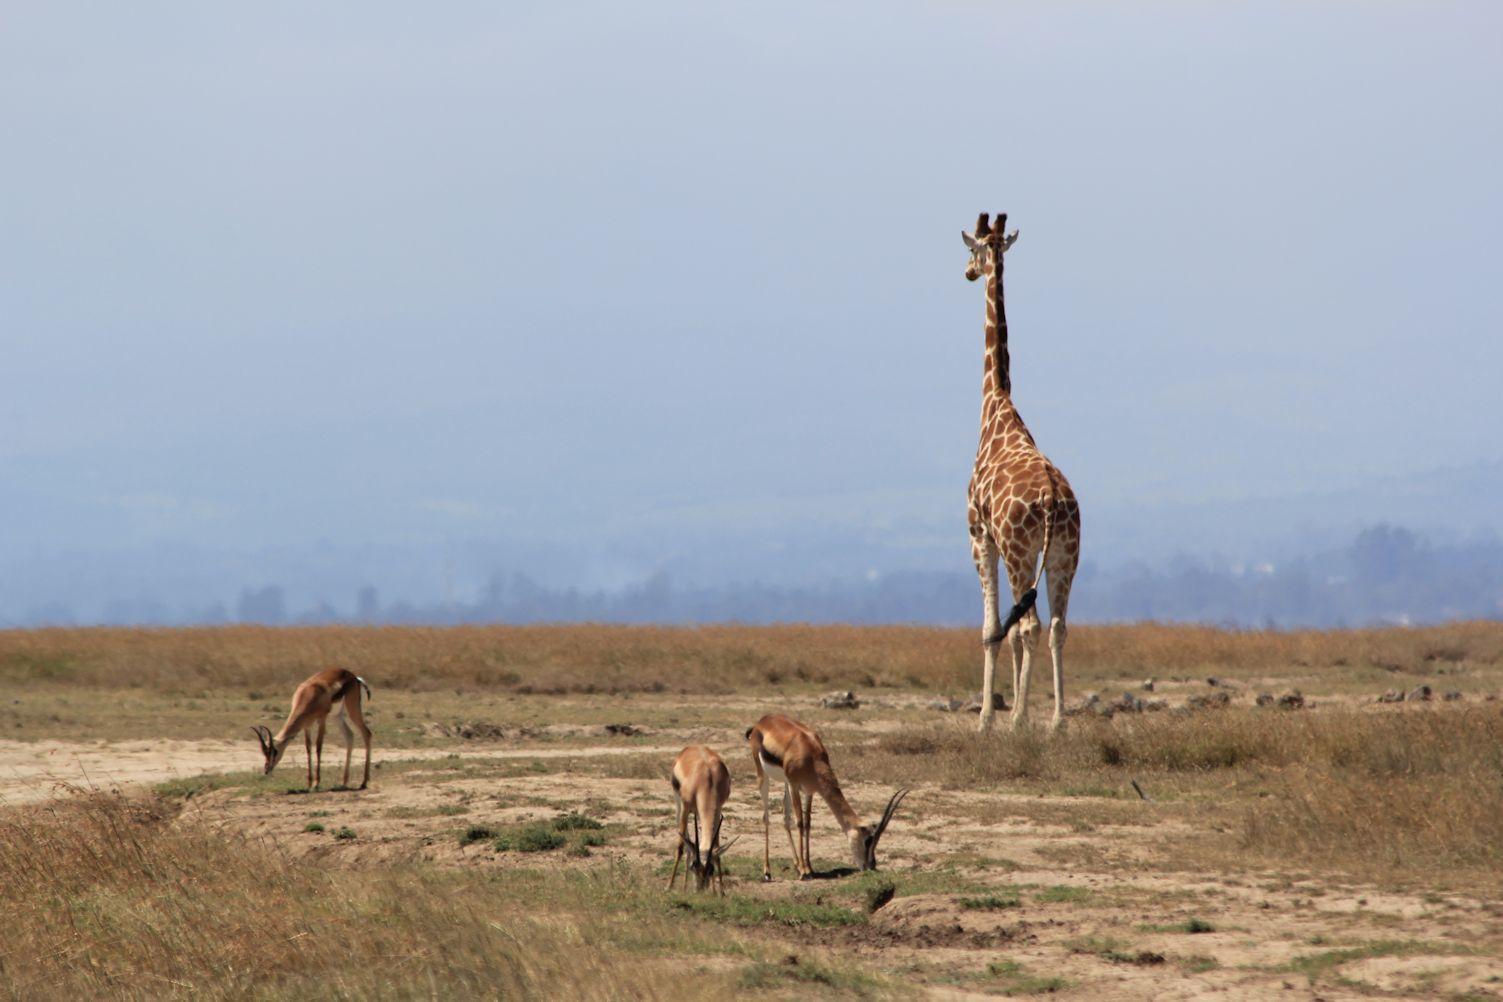 Giraffe and impalas